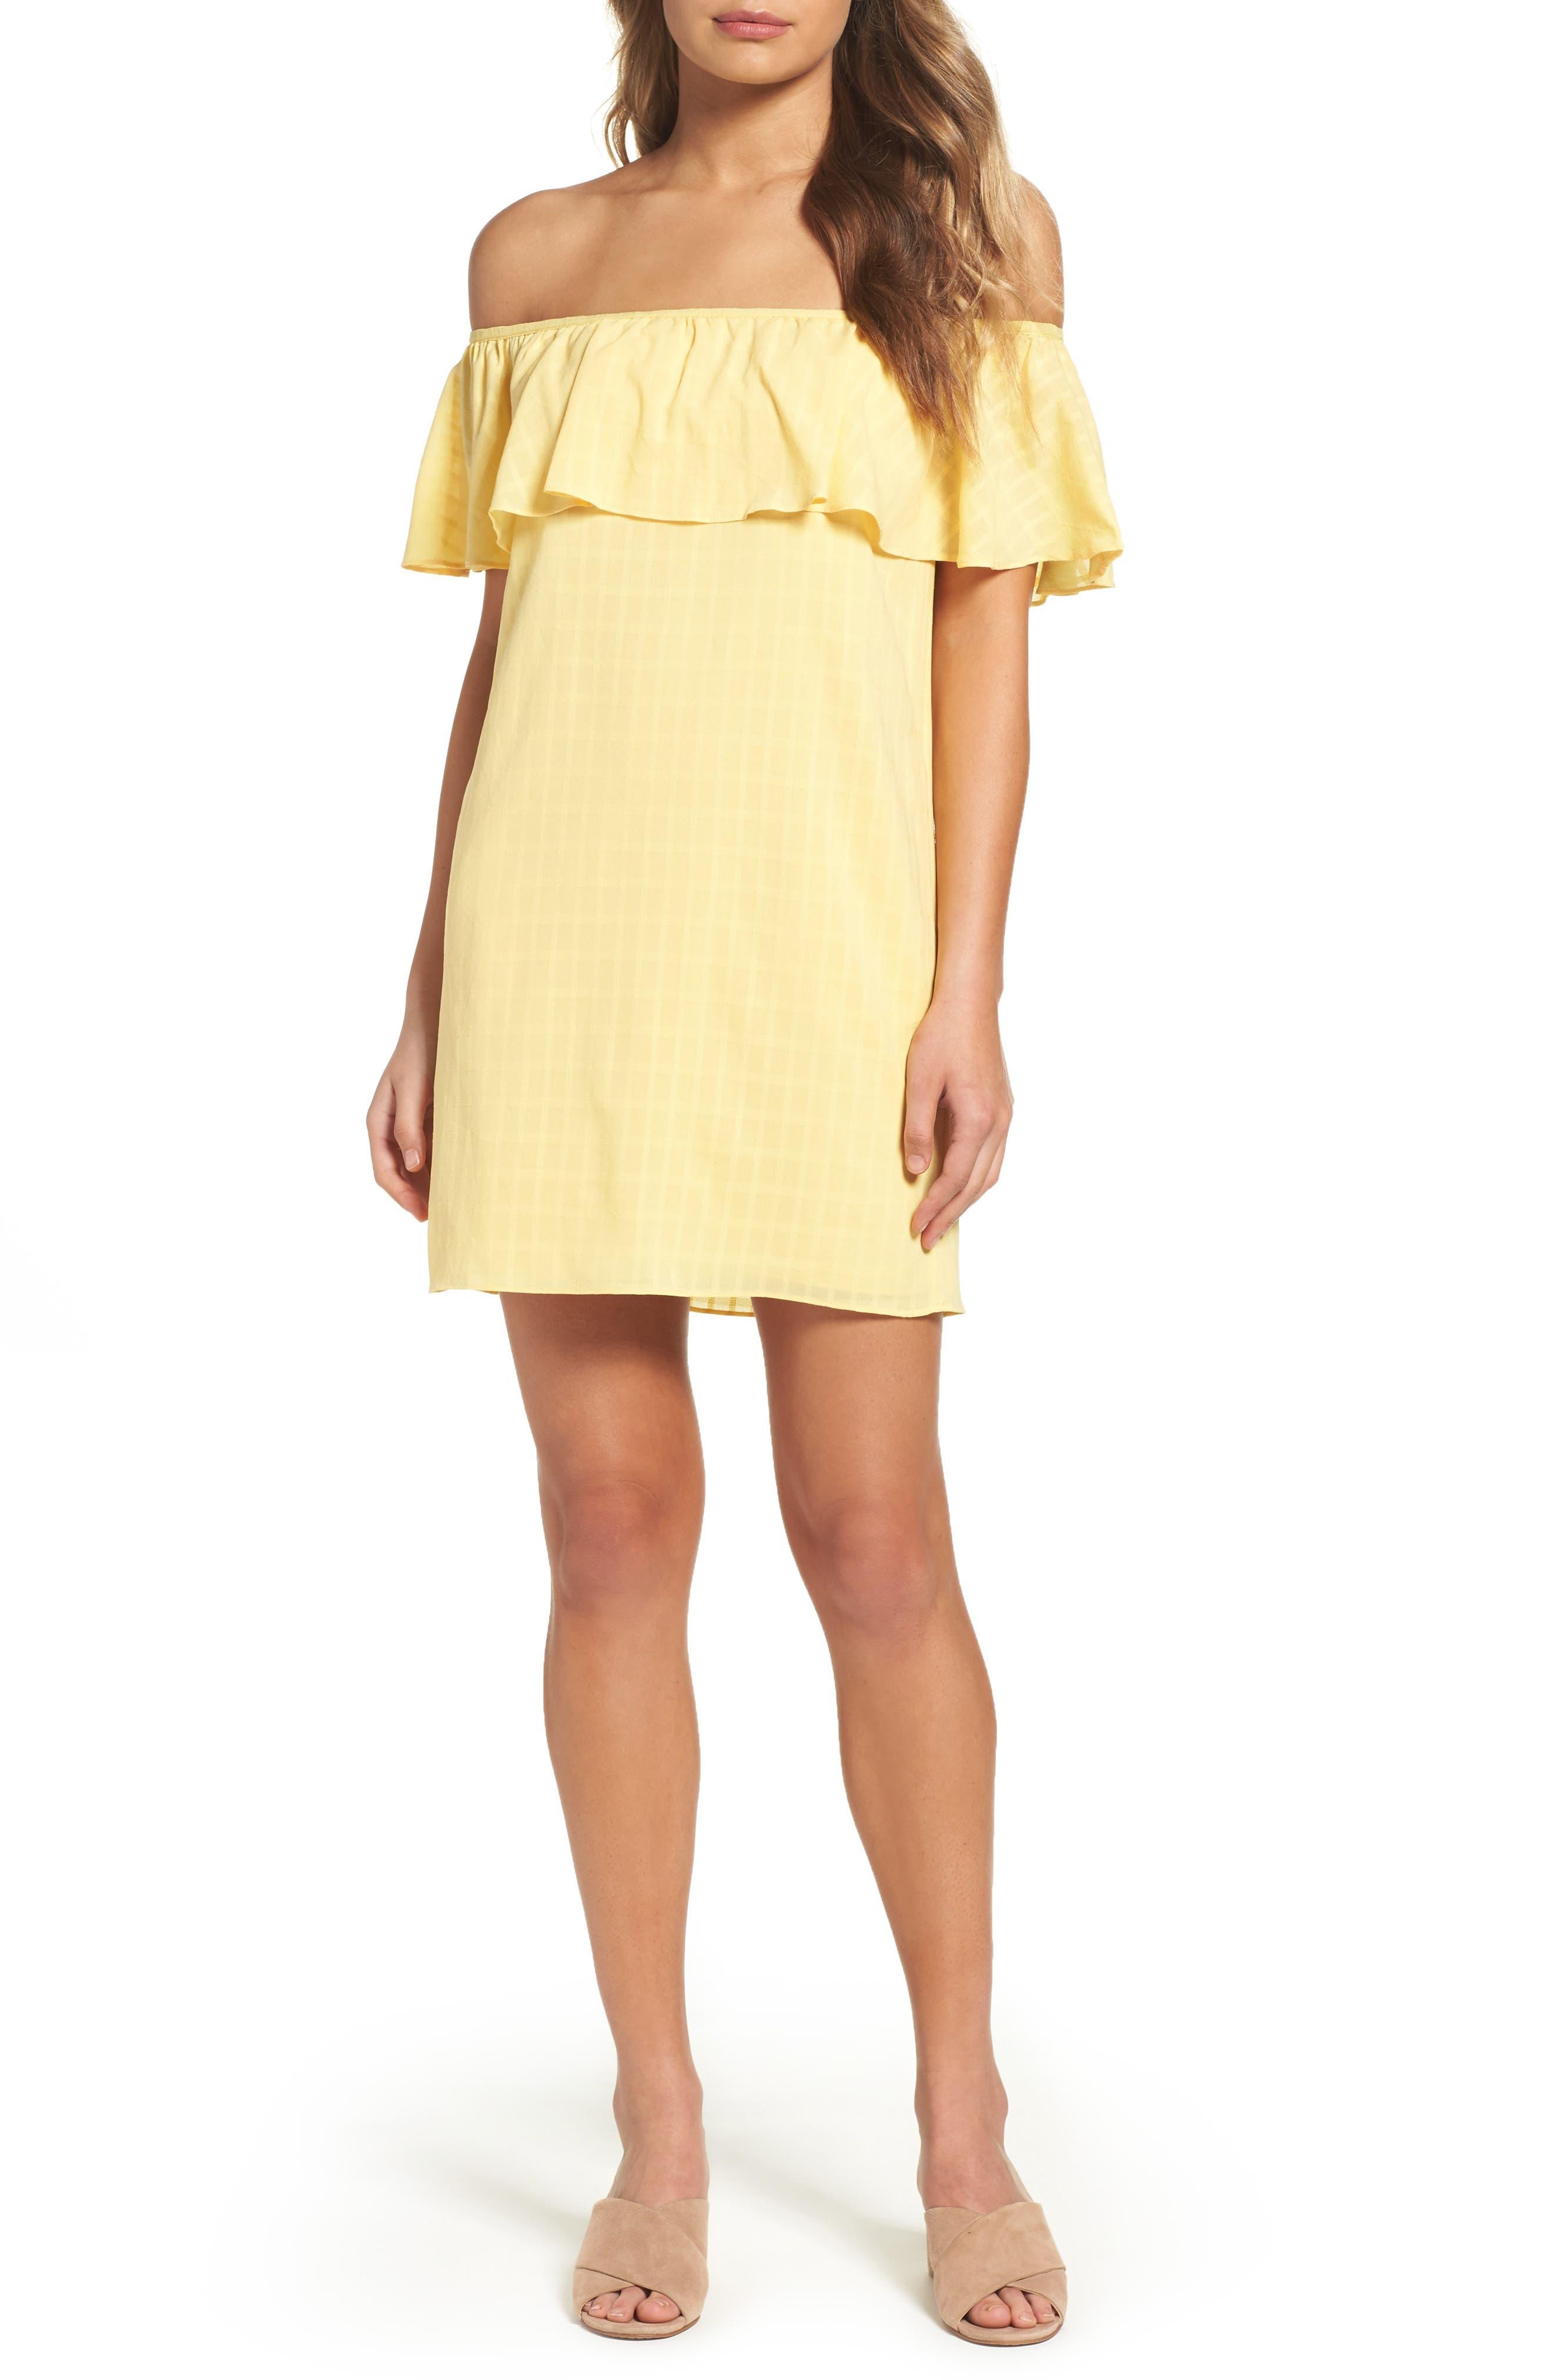 Ali & Jay Bonita Señorita Shift Dress